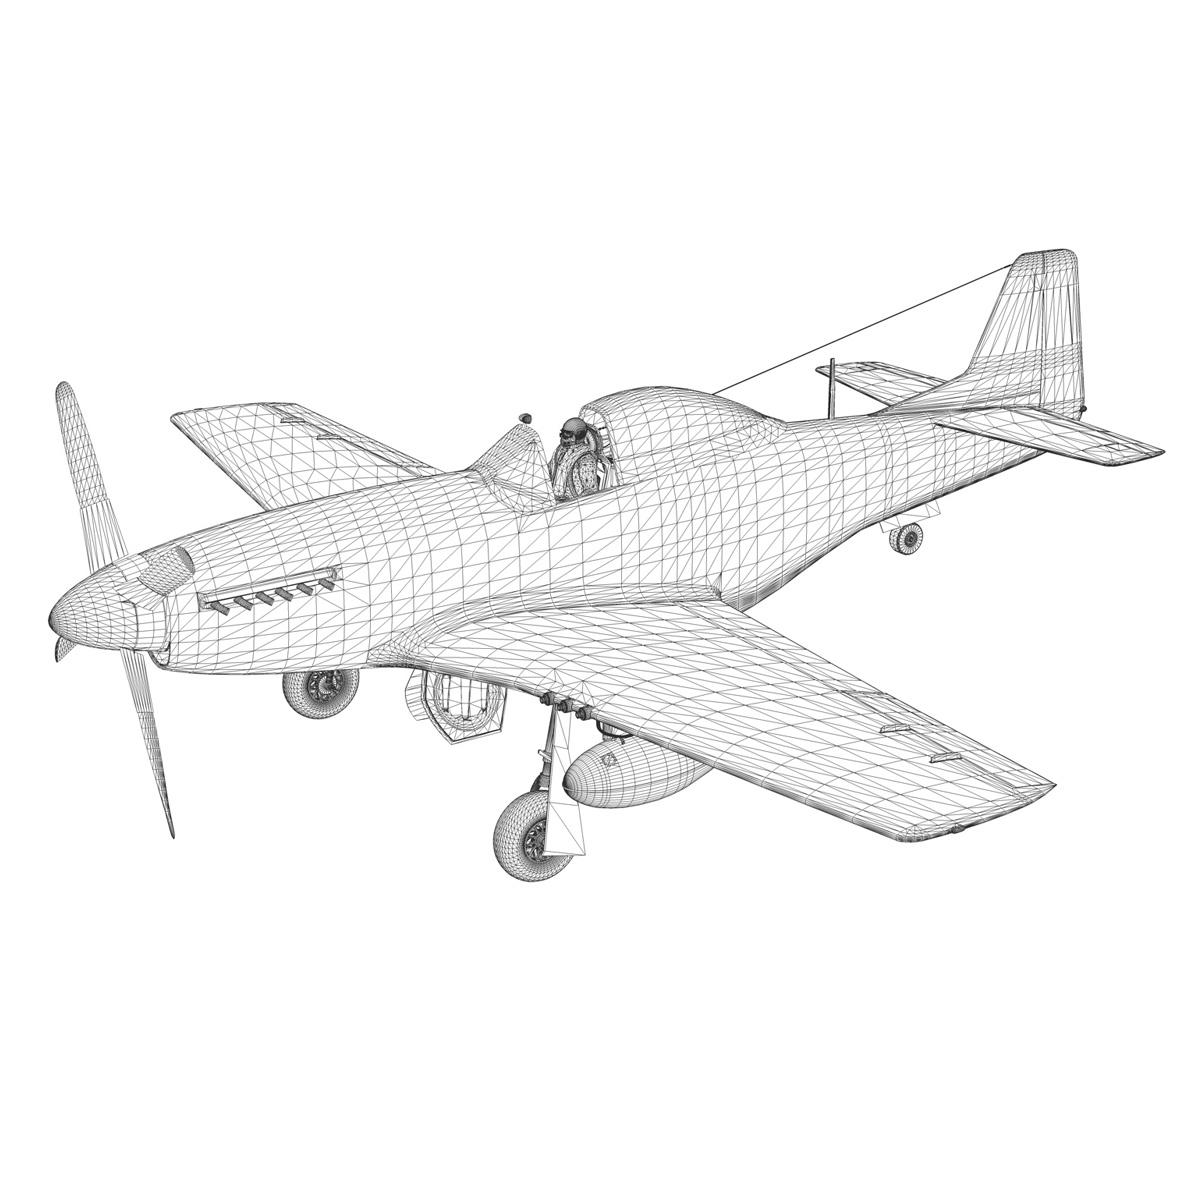 north american p-51d mustang – old crow 3d model fbx c4d lwo obj 273351